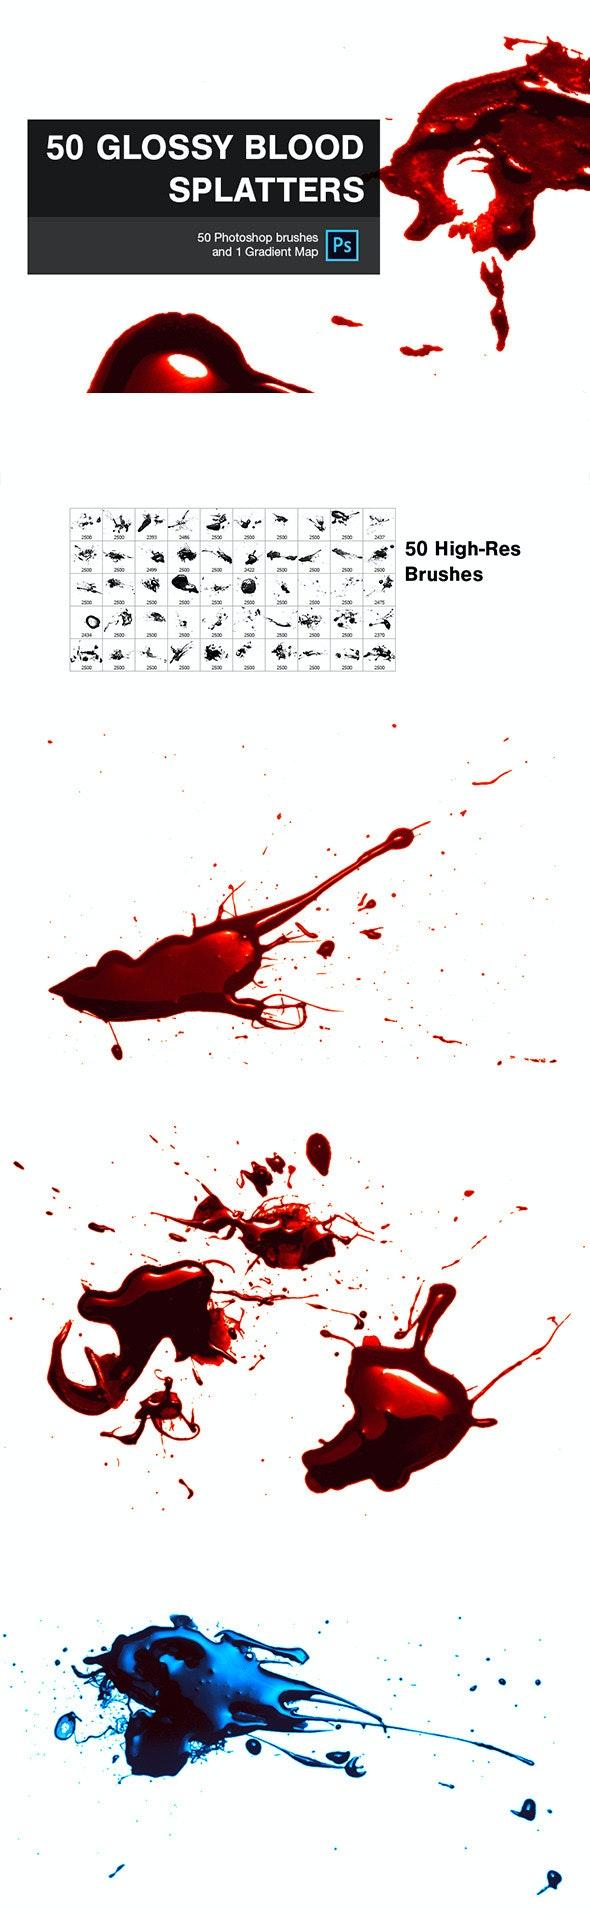 50 Glossy Blood Splatters - Grunge Brushes